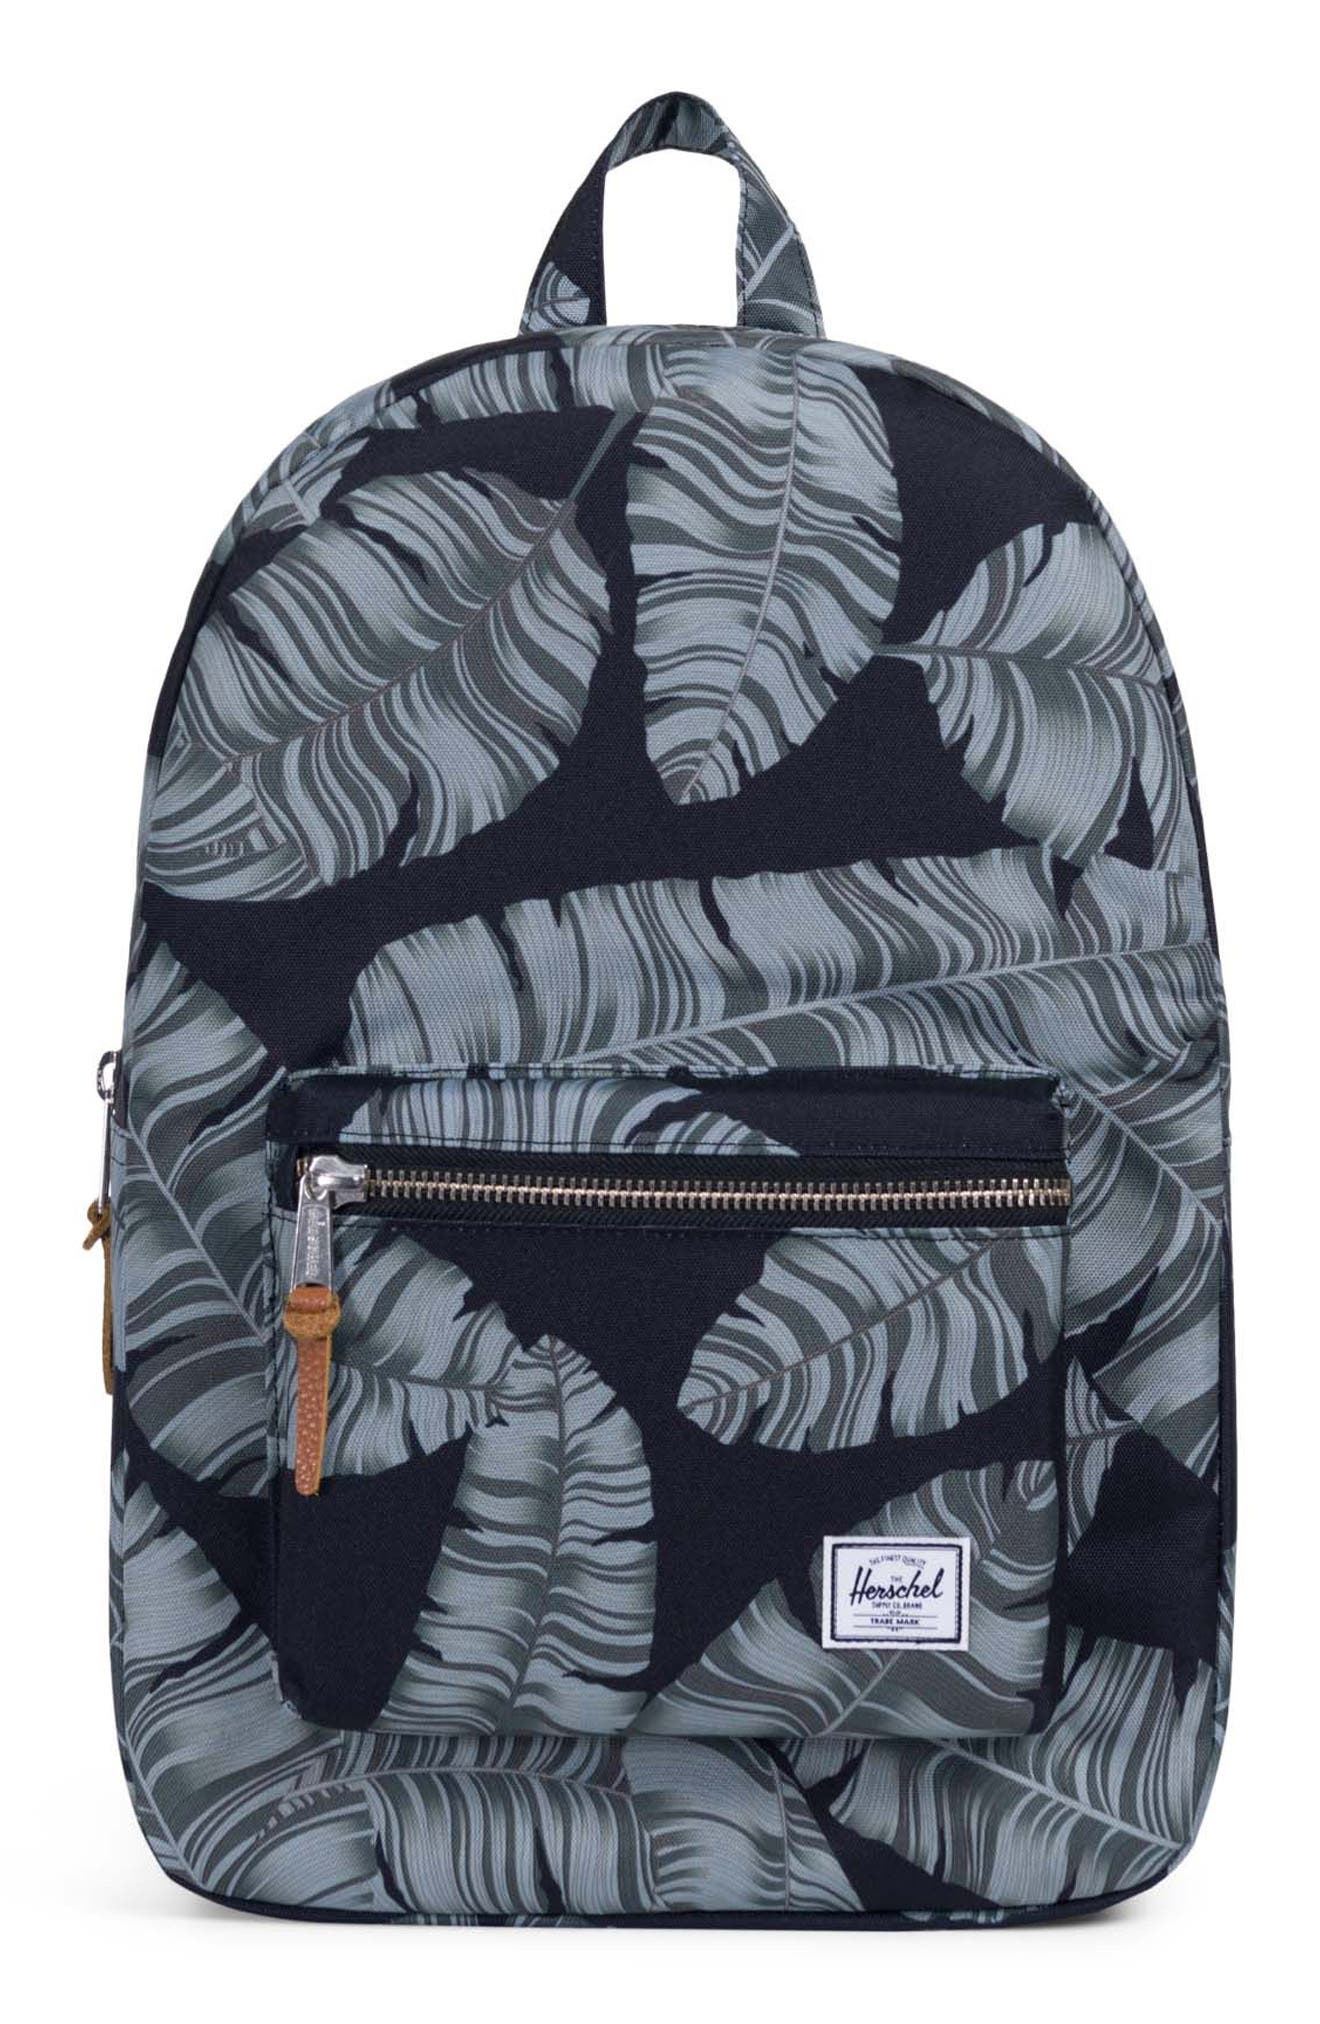 Settlement Aspect Backpack,                             Main thumbnail 1, color,                             Black Palm